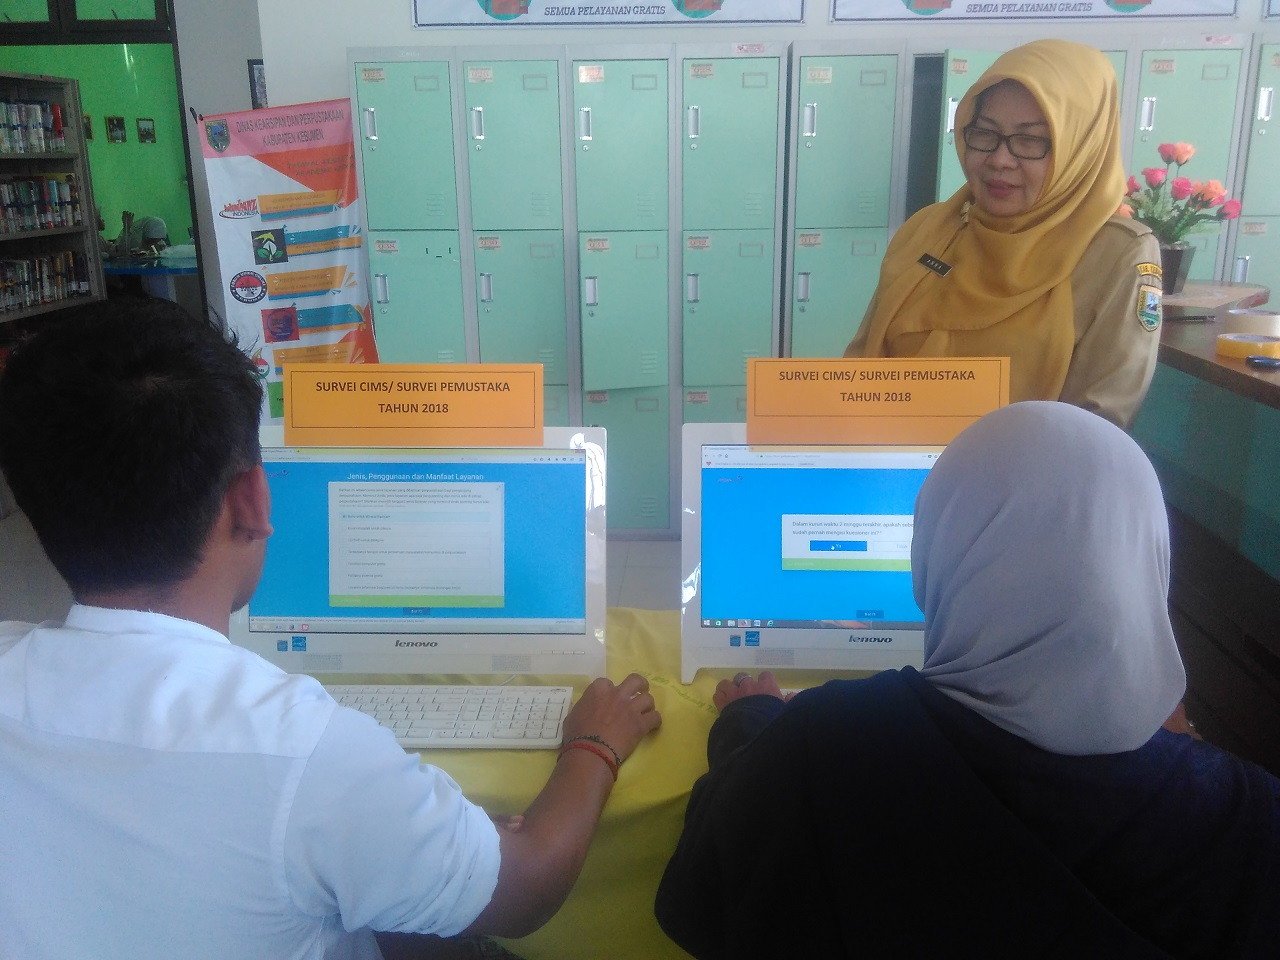 Pelaksanaan Survey CIMS Disarpus Kebumen berbasis Online